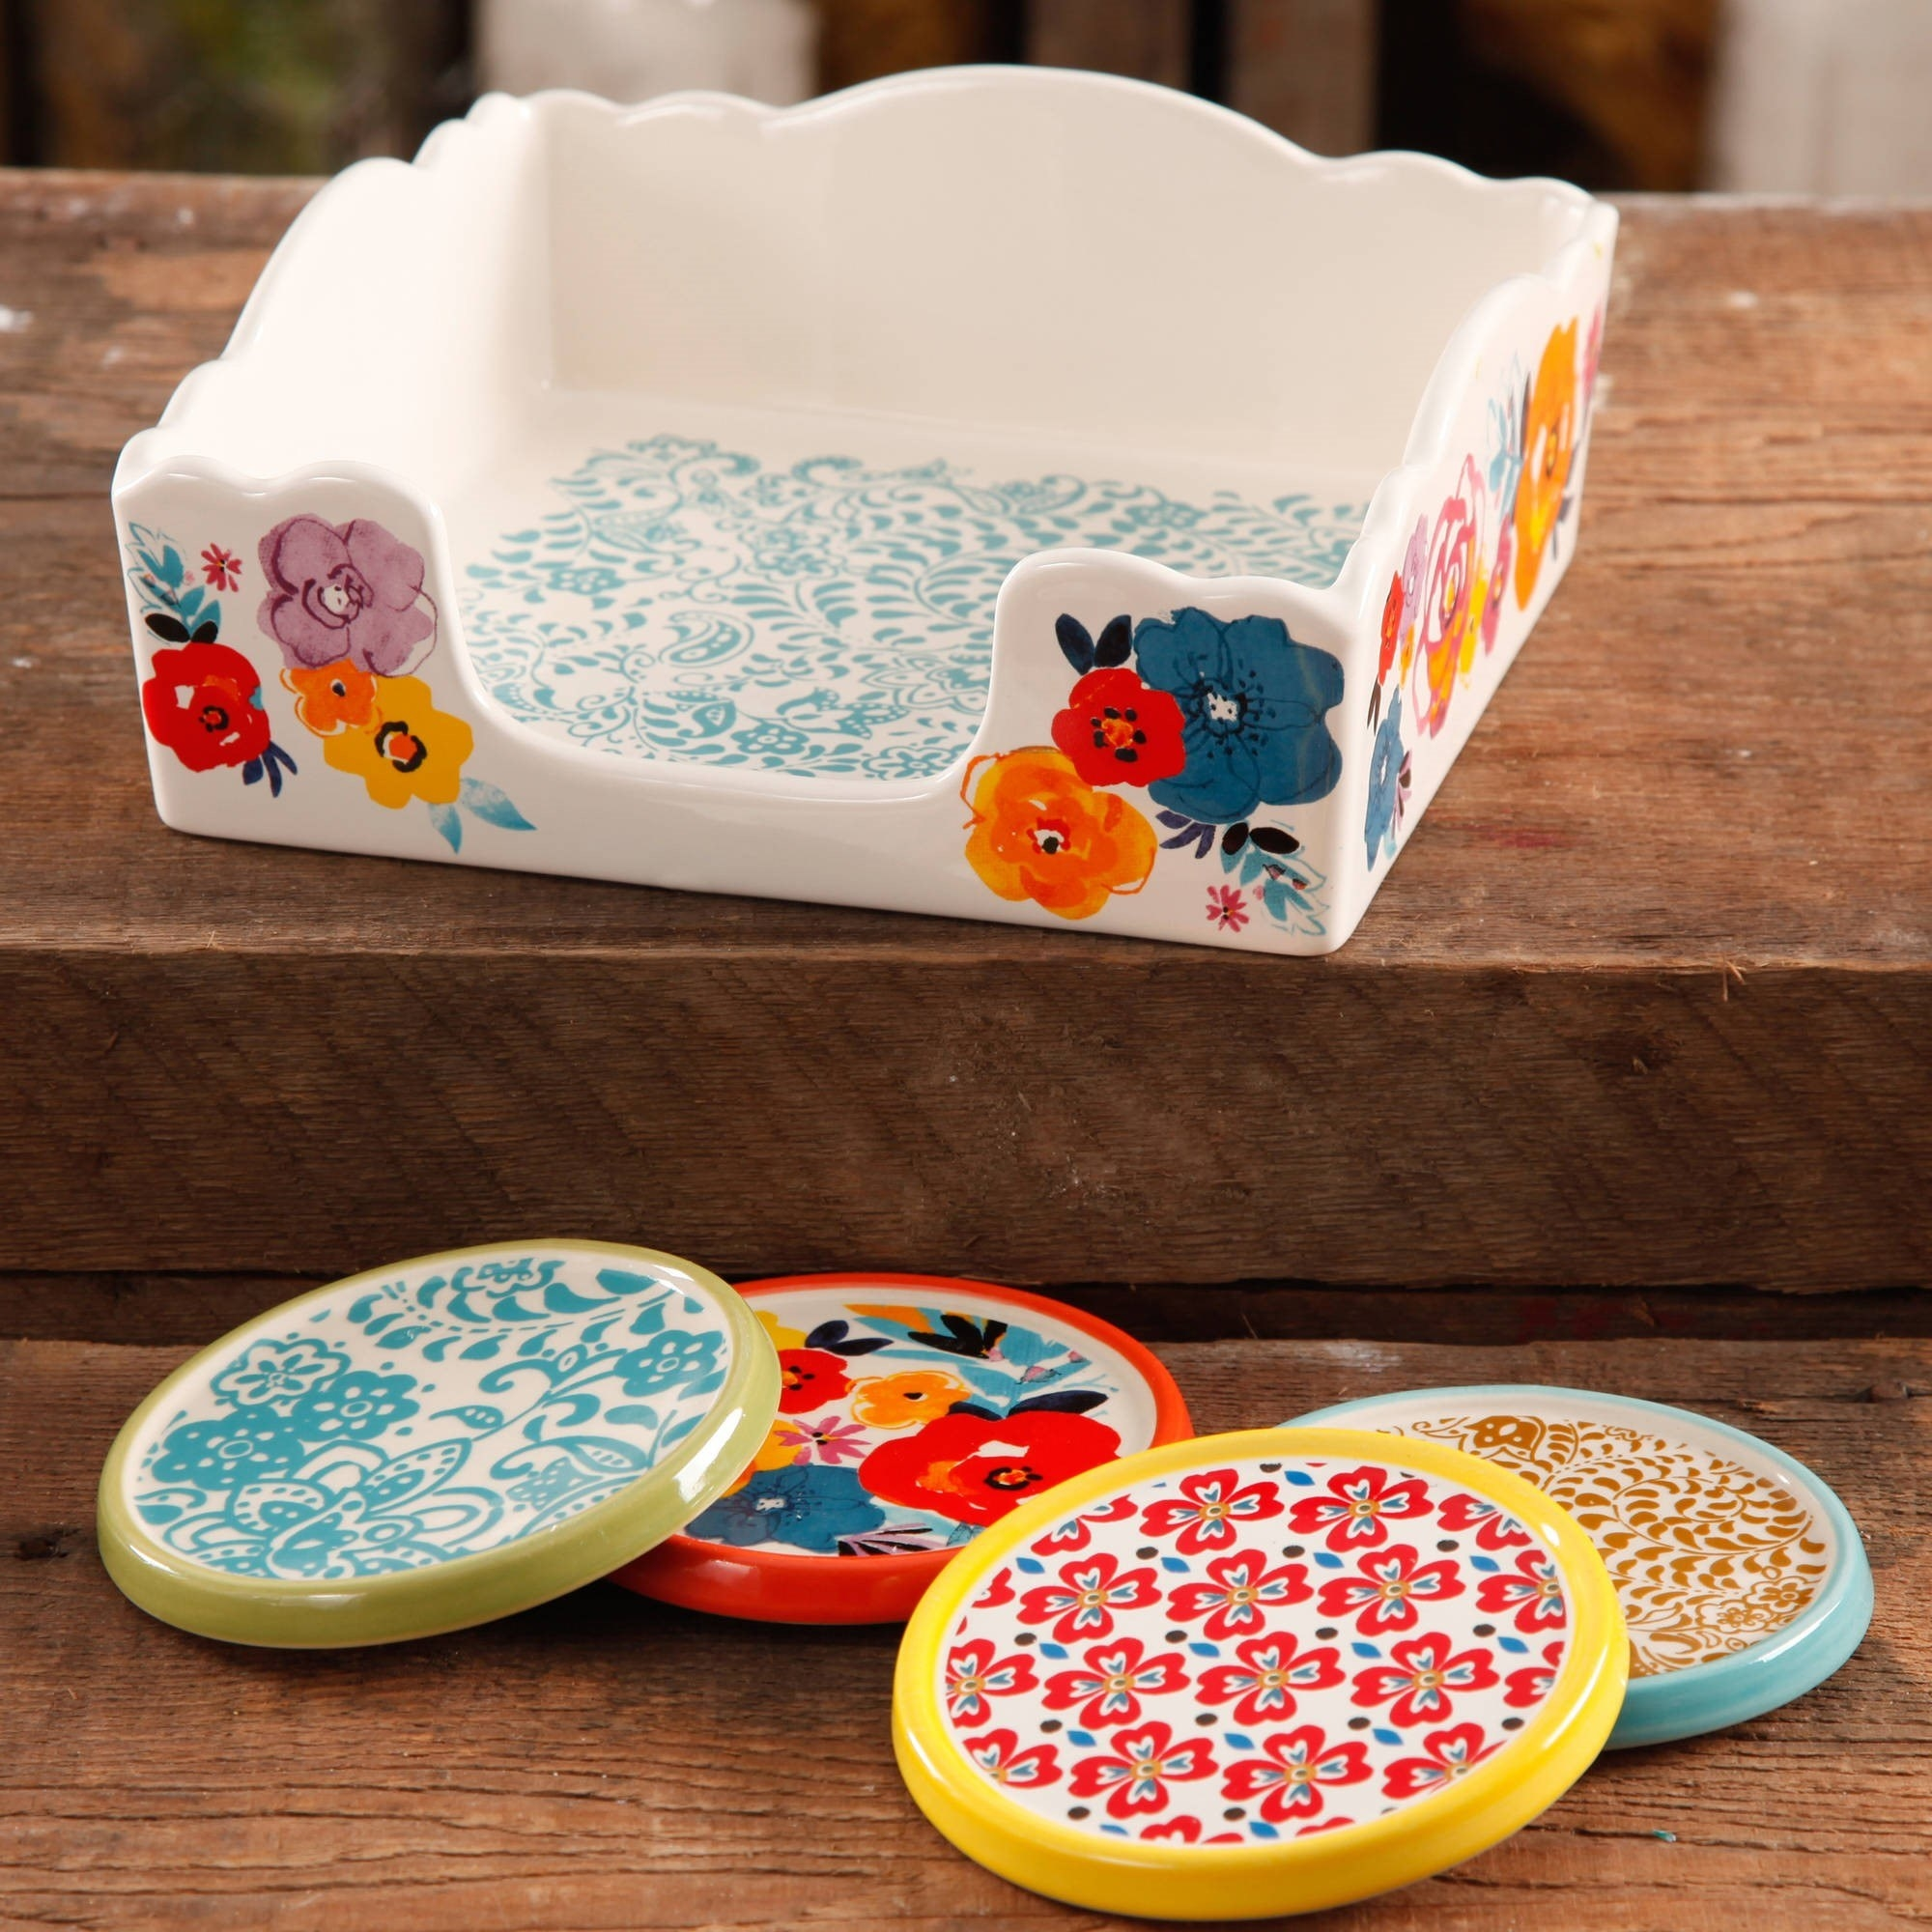 The flea market stoneware coasters and napkin box set